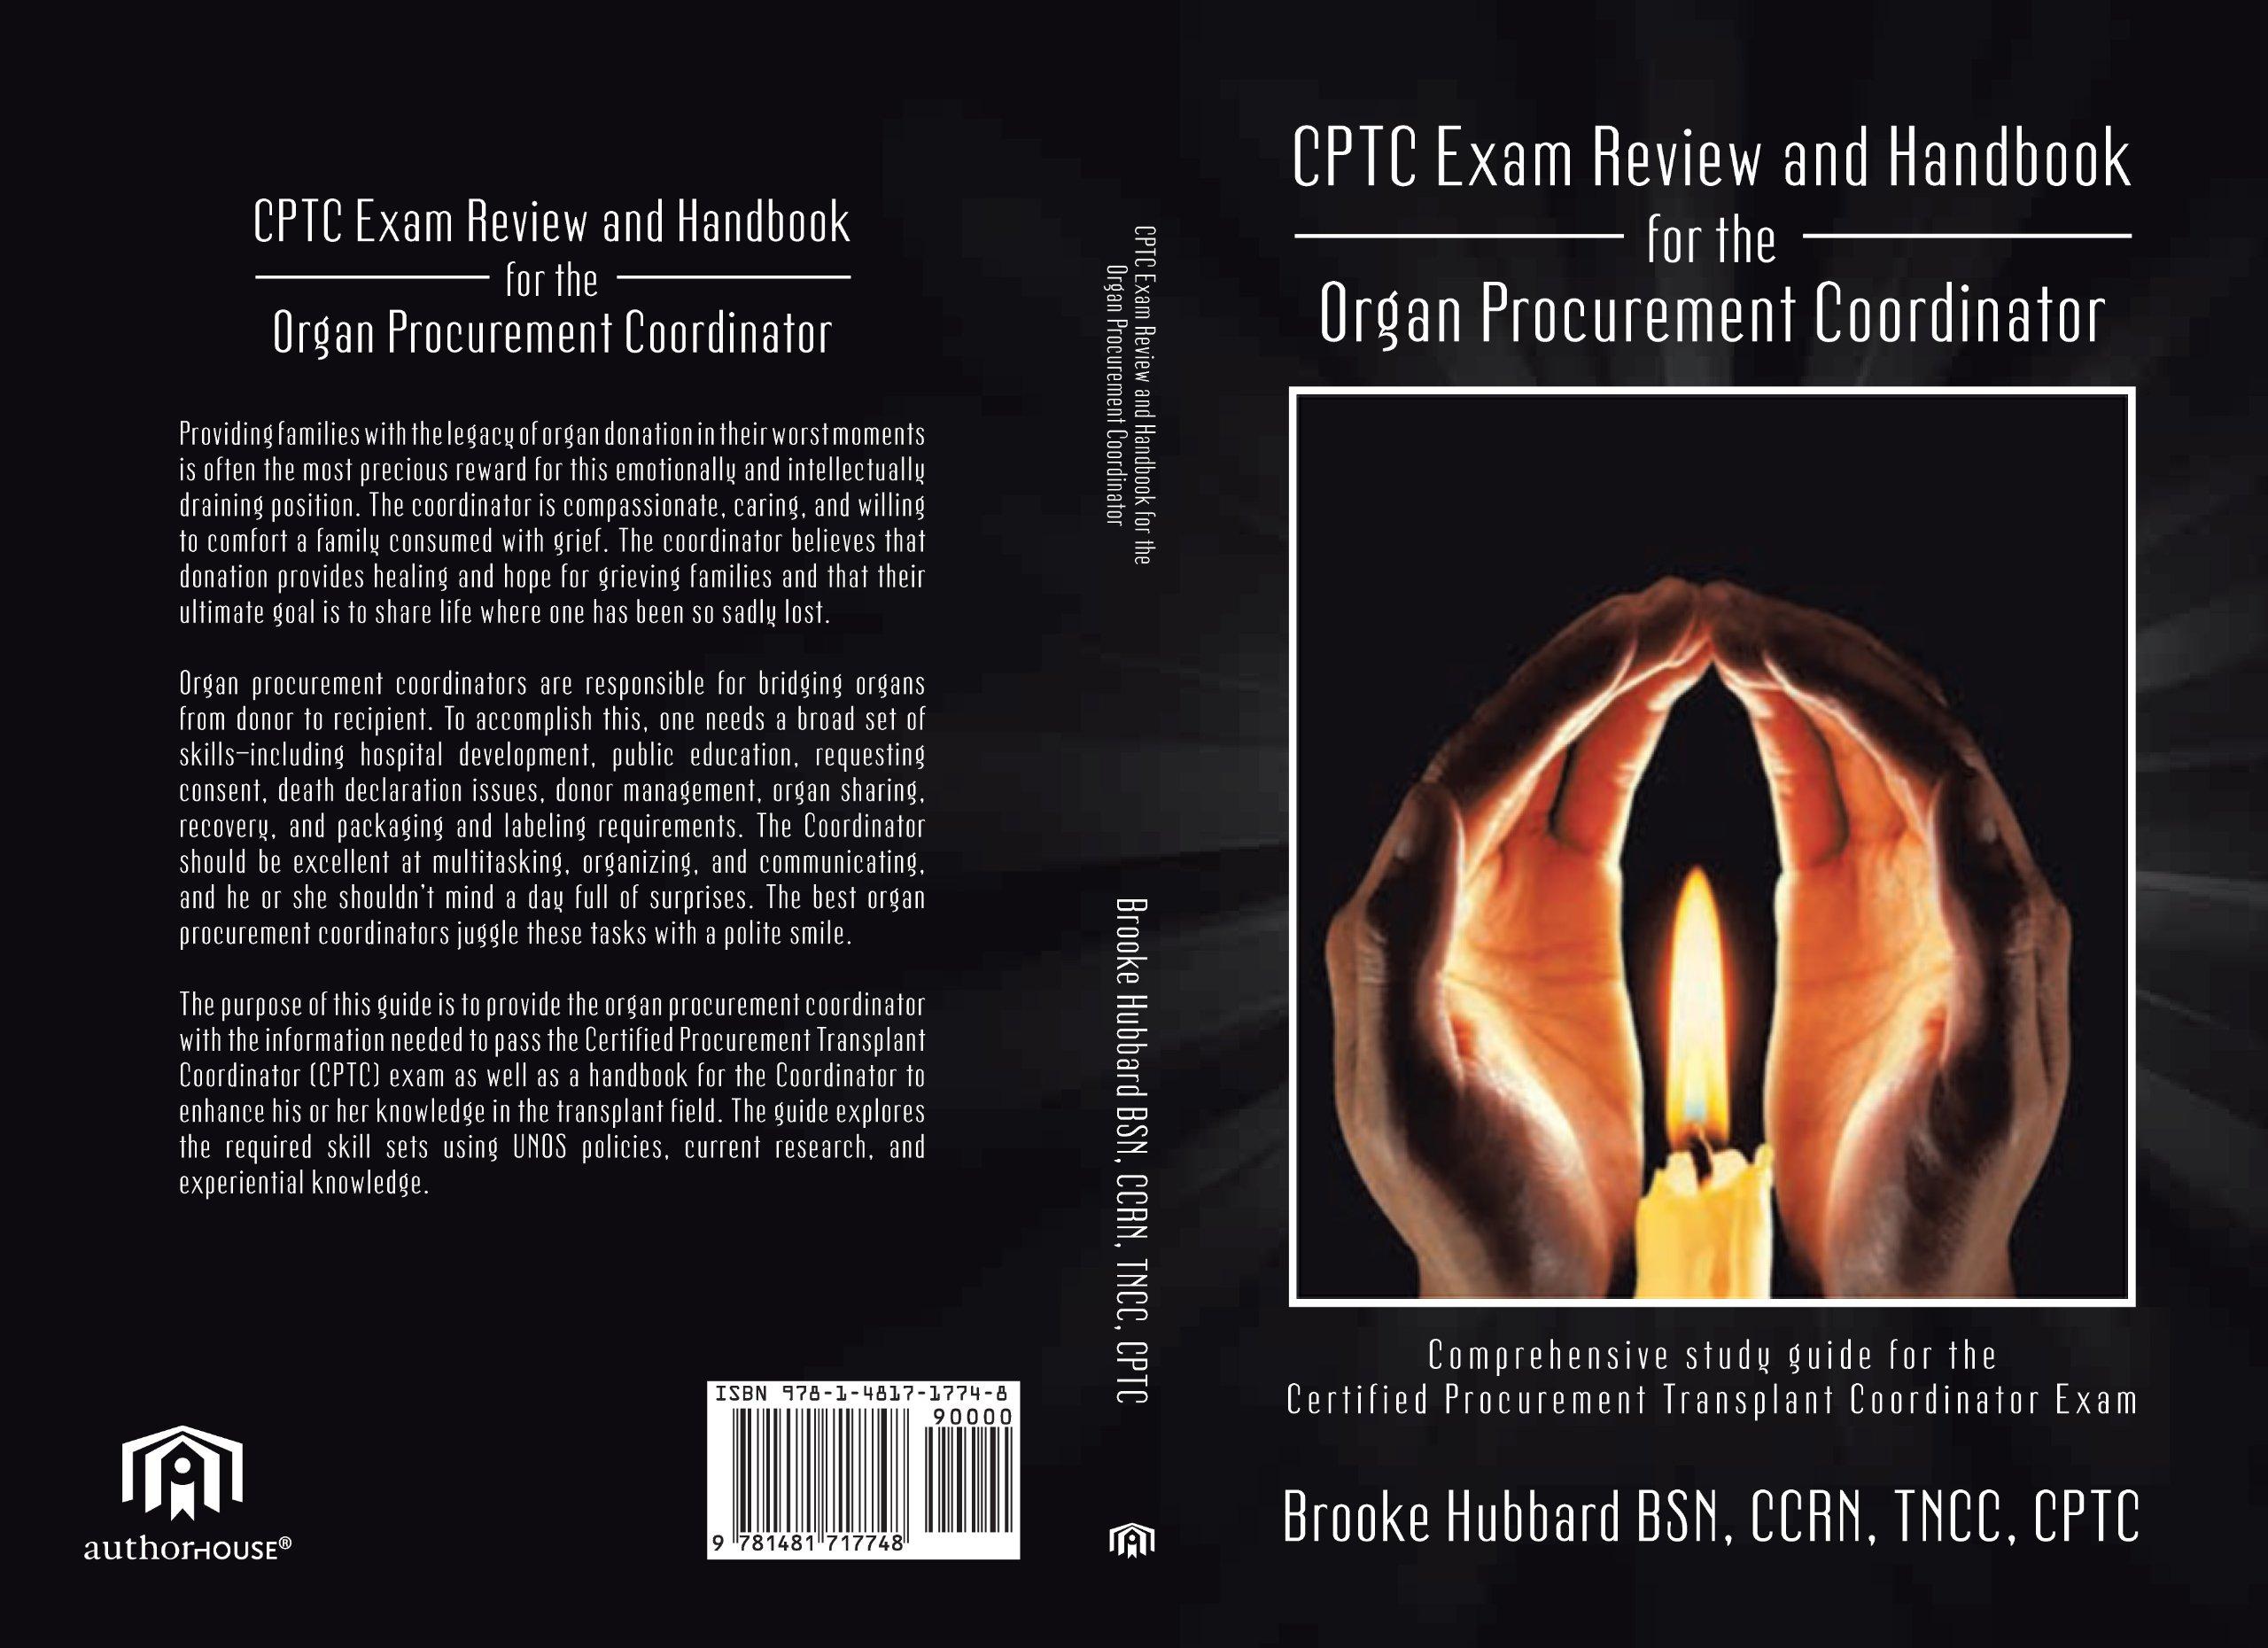 Cptc Exam Review And Handbook For The Organ Procurement Coordinator